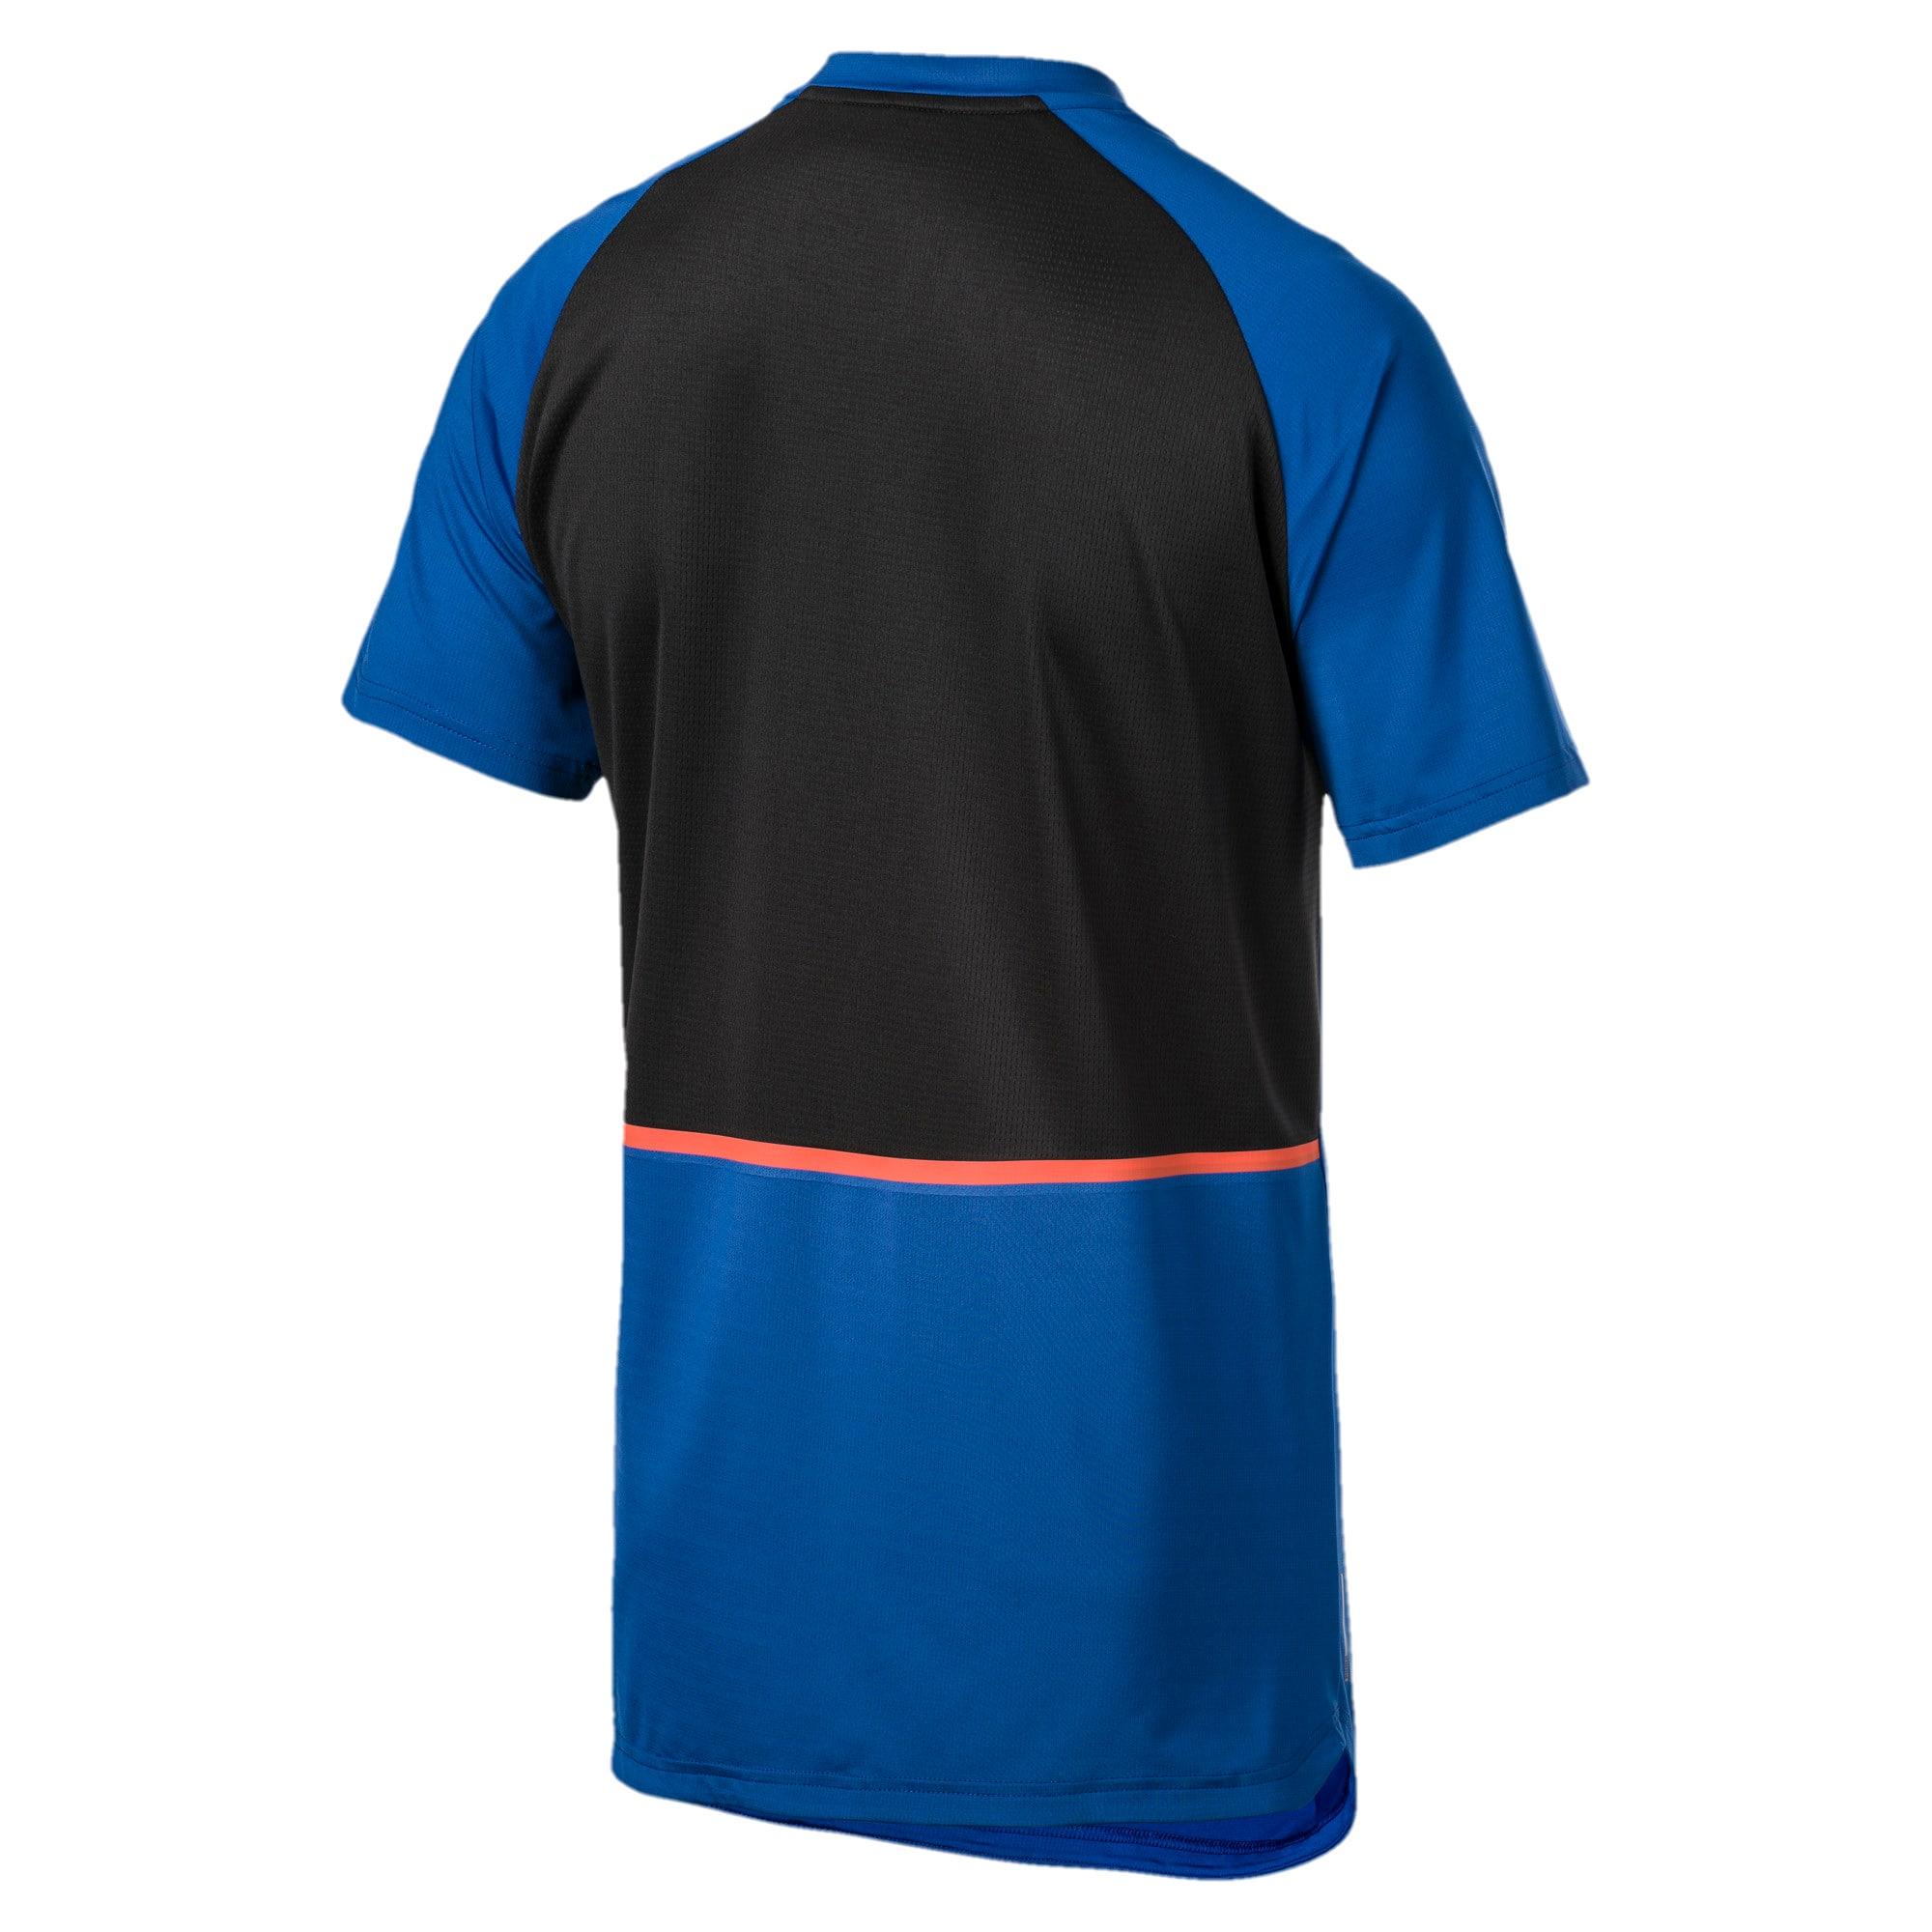 Thumbnail 5 of Power BND T-shirt voor heren, Galaxy Blue-Puma Black, medium